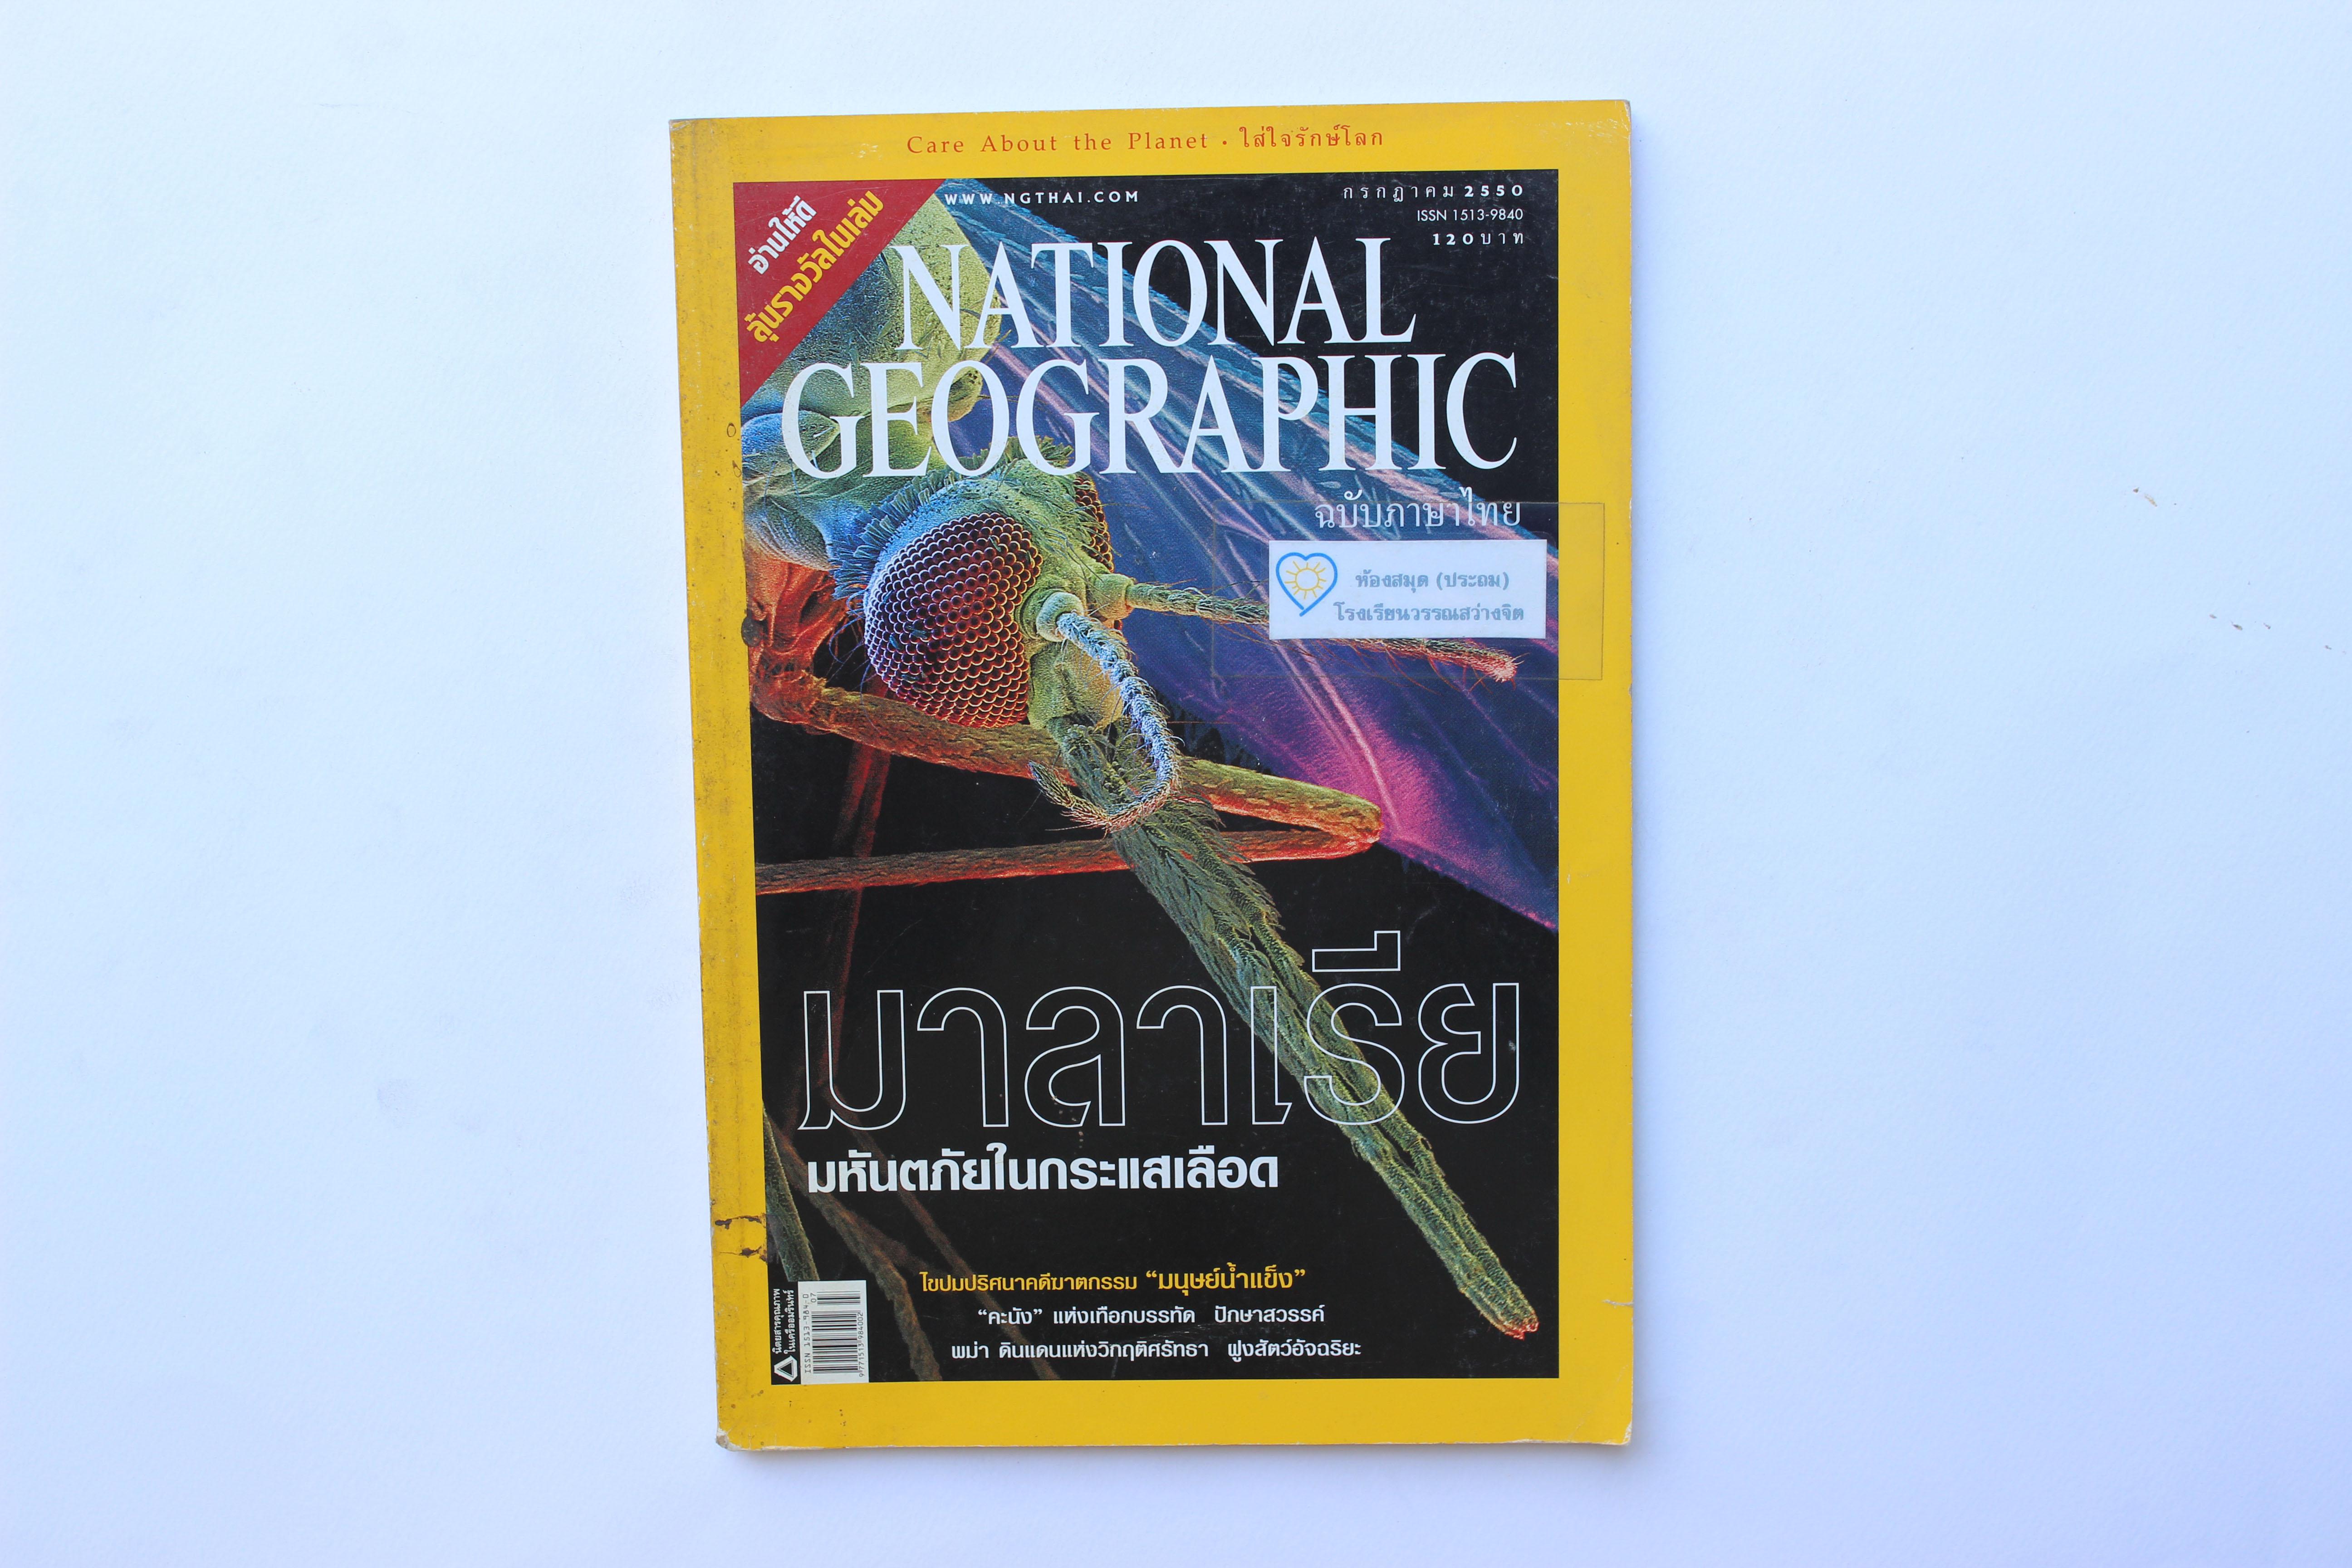 NATIONAL GEOGRAPHIC ฉบับภาษาไทย กรกฎาคม 2550 มาลาเรีย มหันตภัยในกระแสเลือด *** (สินค้าหมดแล้ว)